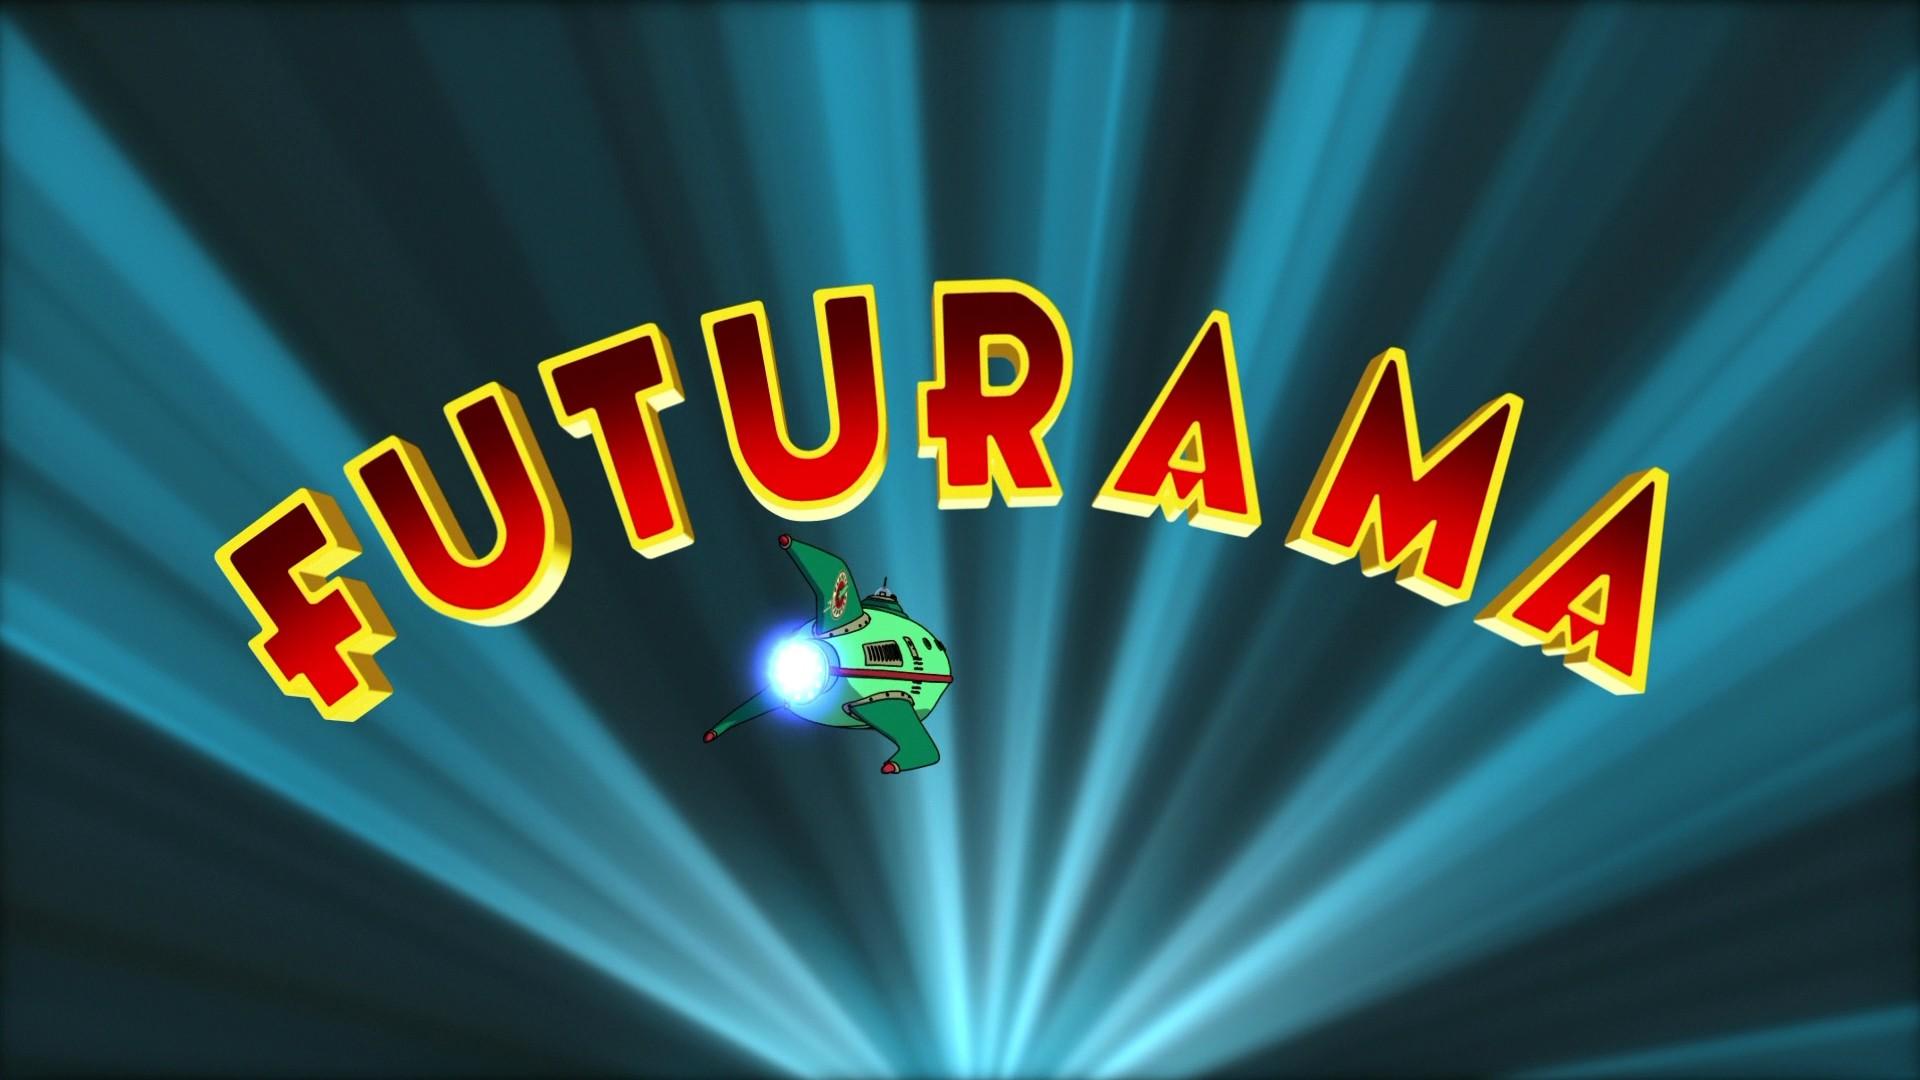 futurama cartoon logo wallpaper 49607